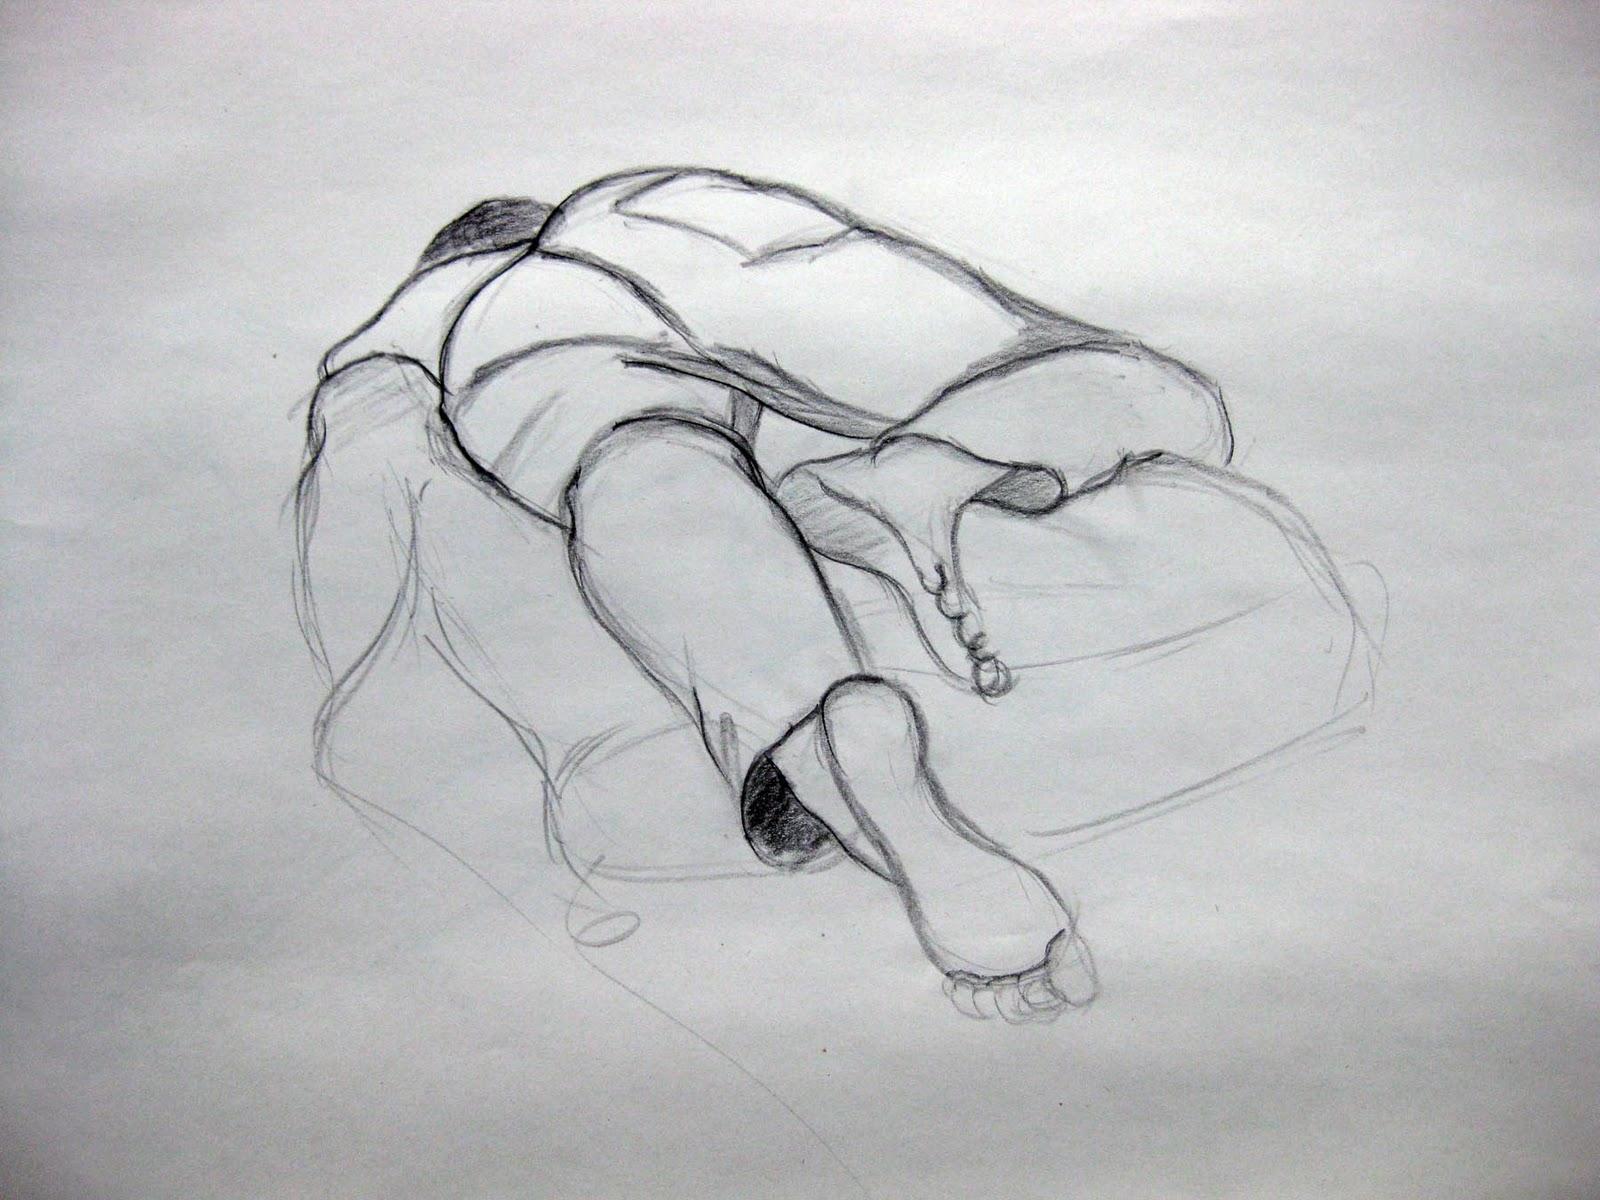 Diane Pascual : Foreshortening poses